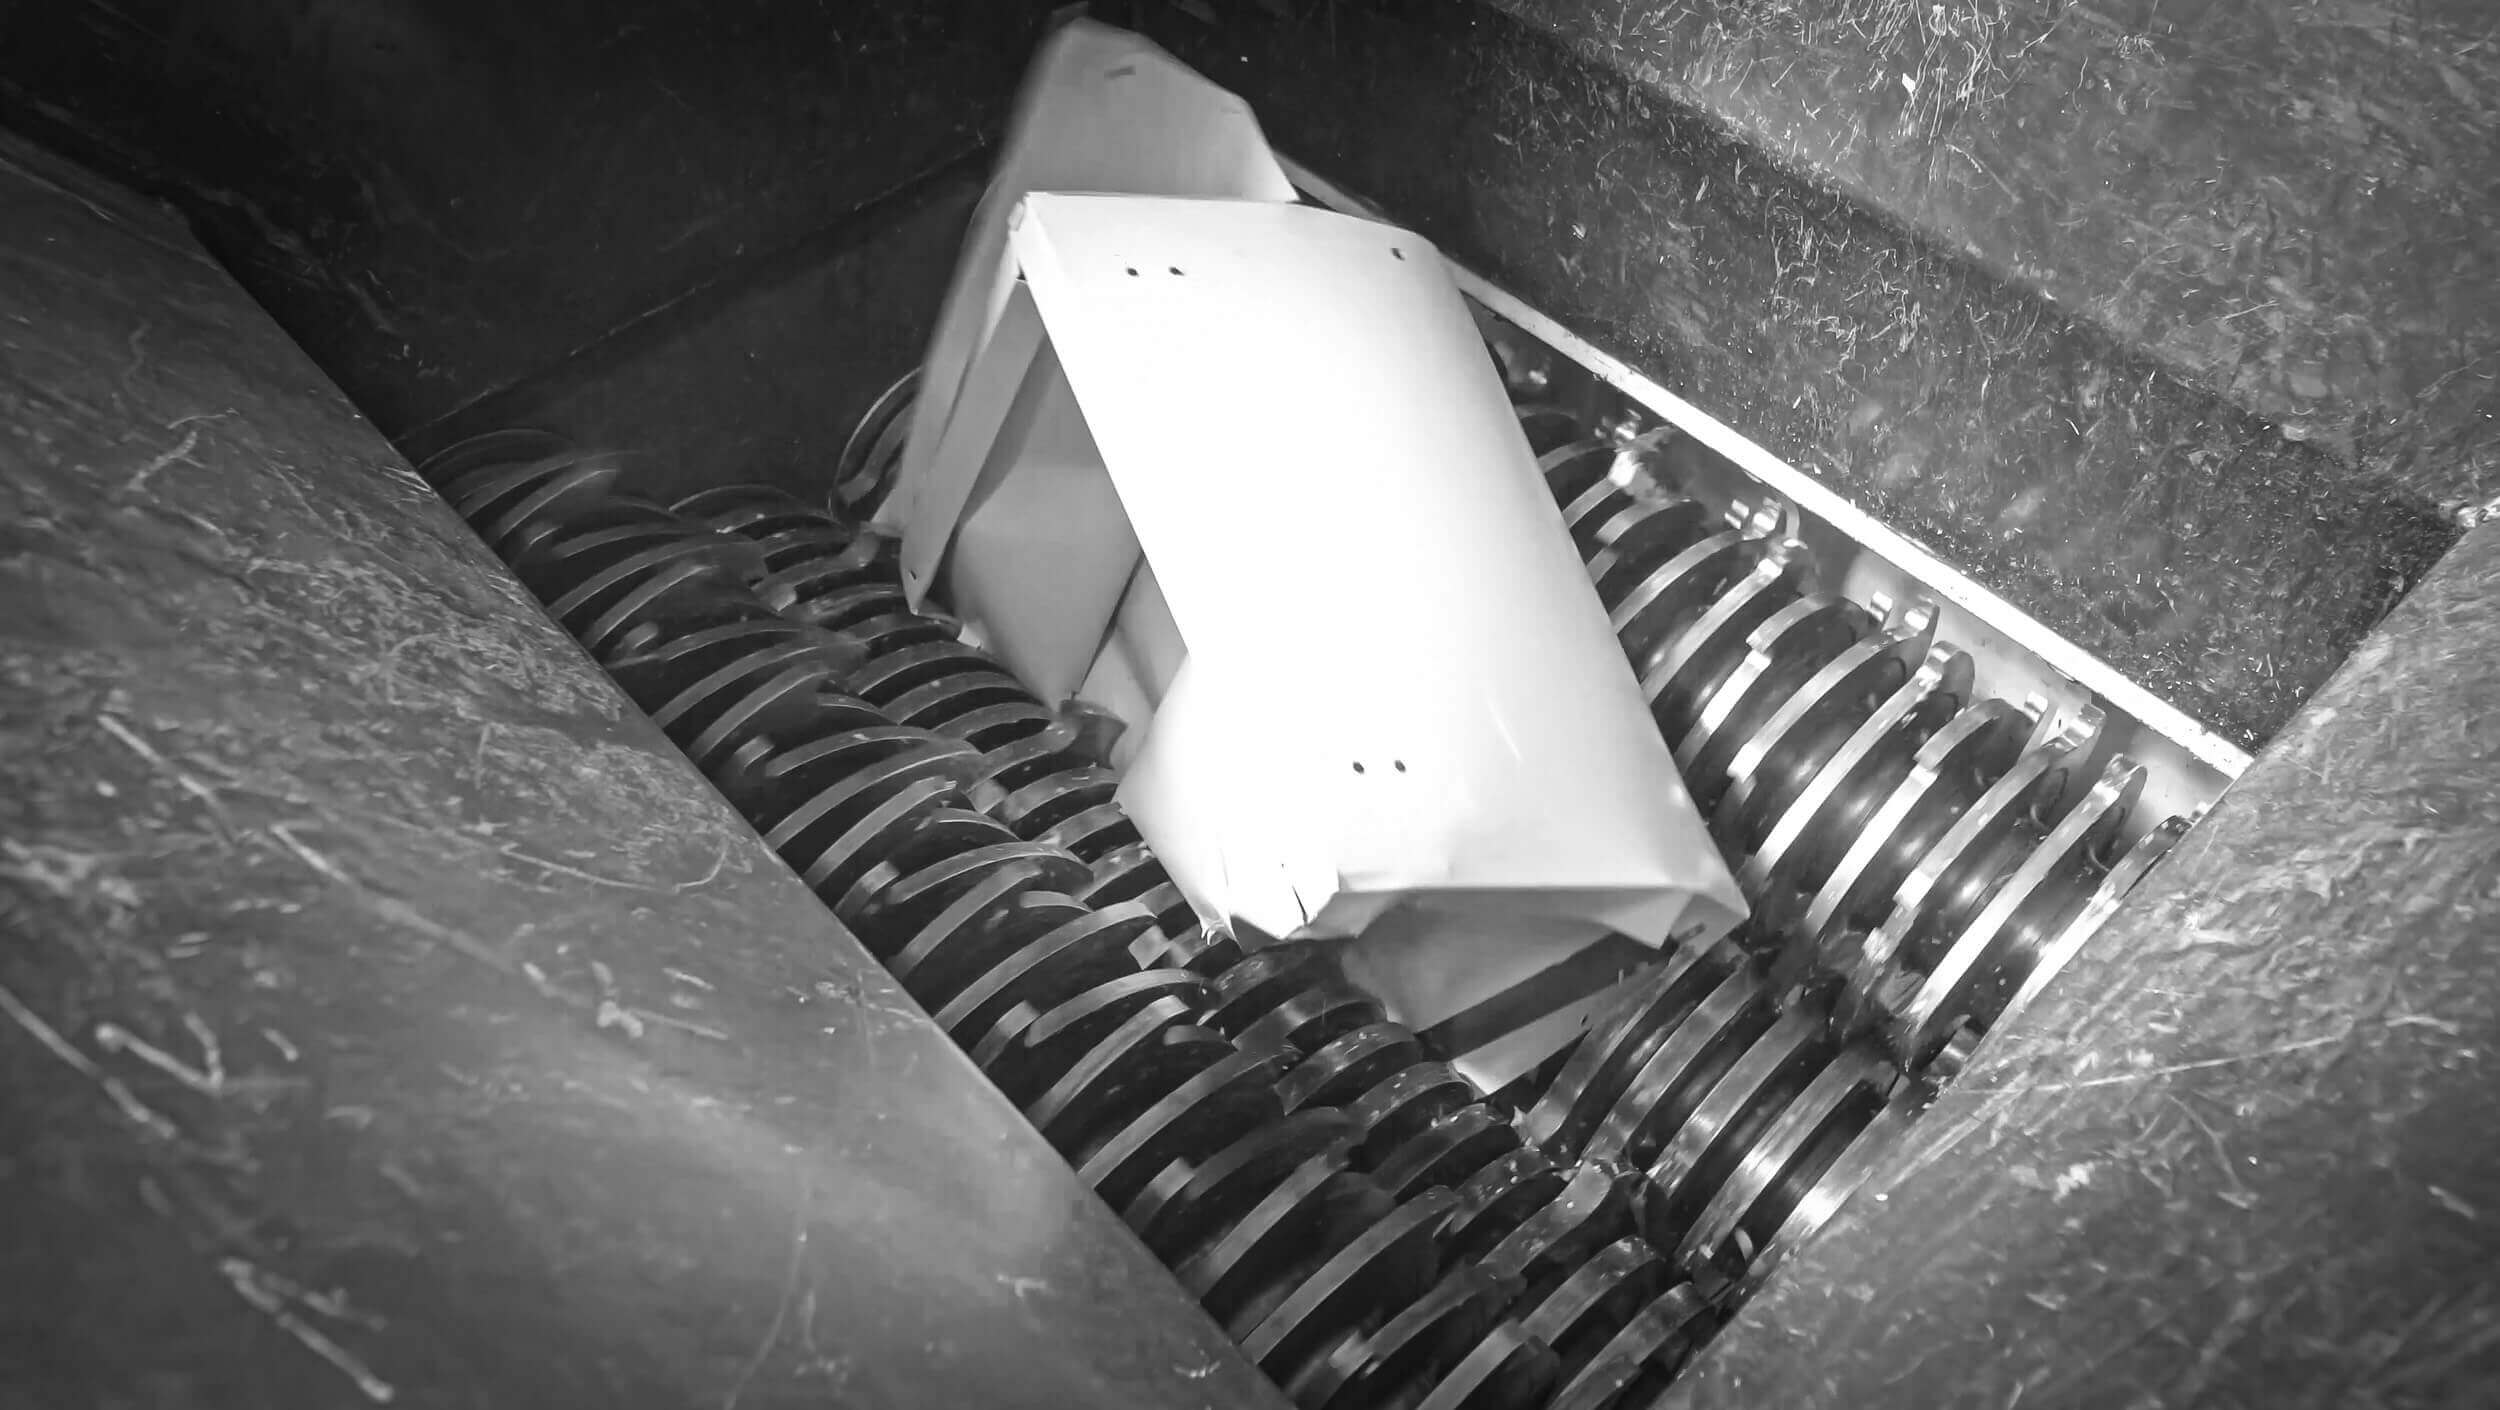 Shredding of metal cabinets with a WEIMA four-shaft shredder